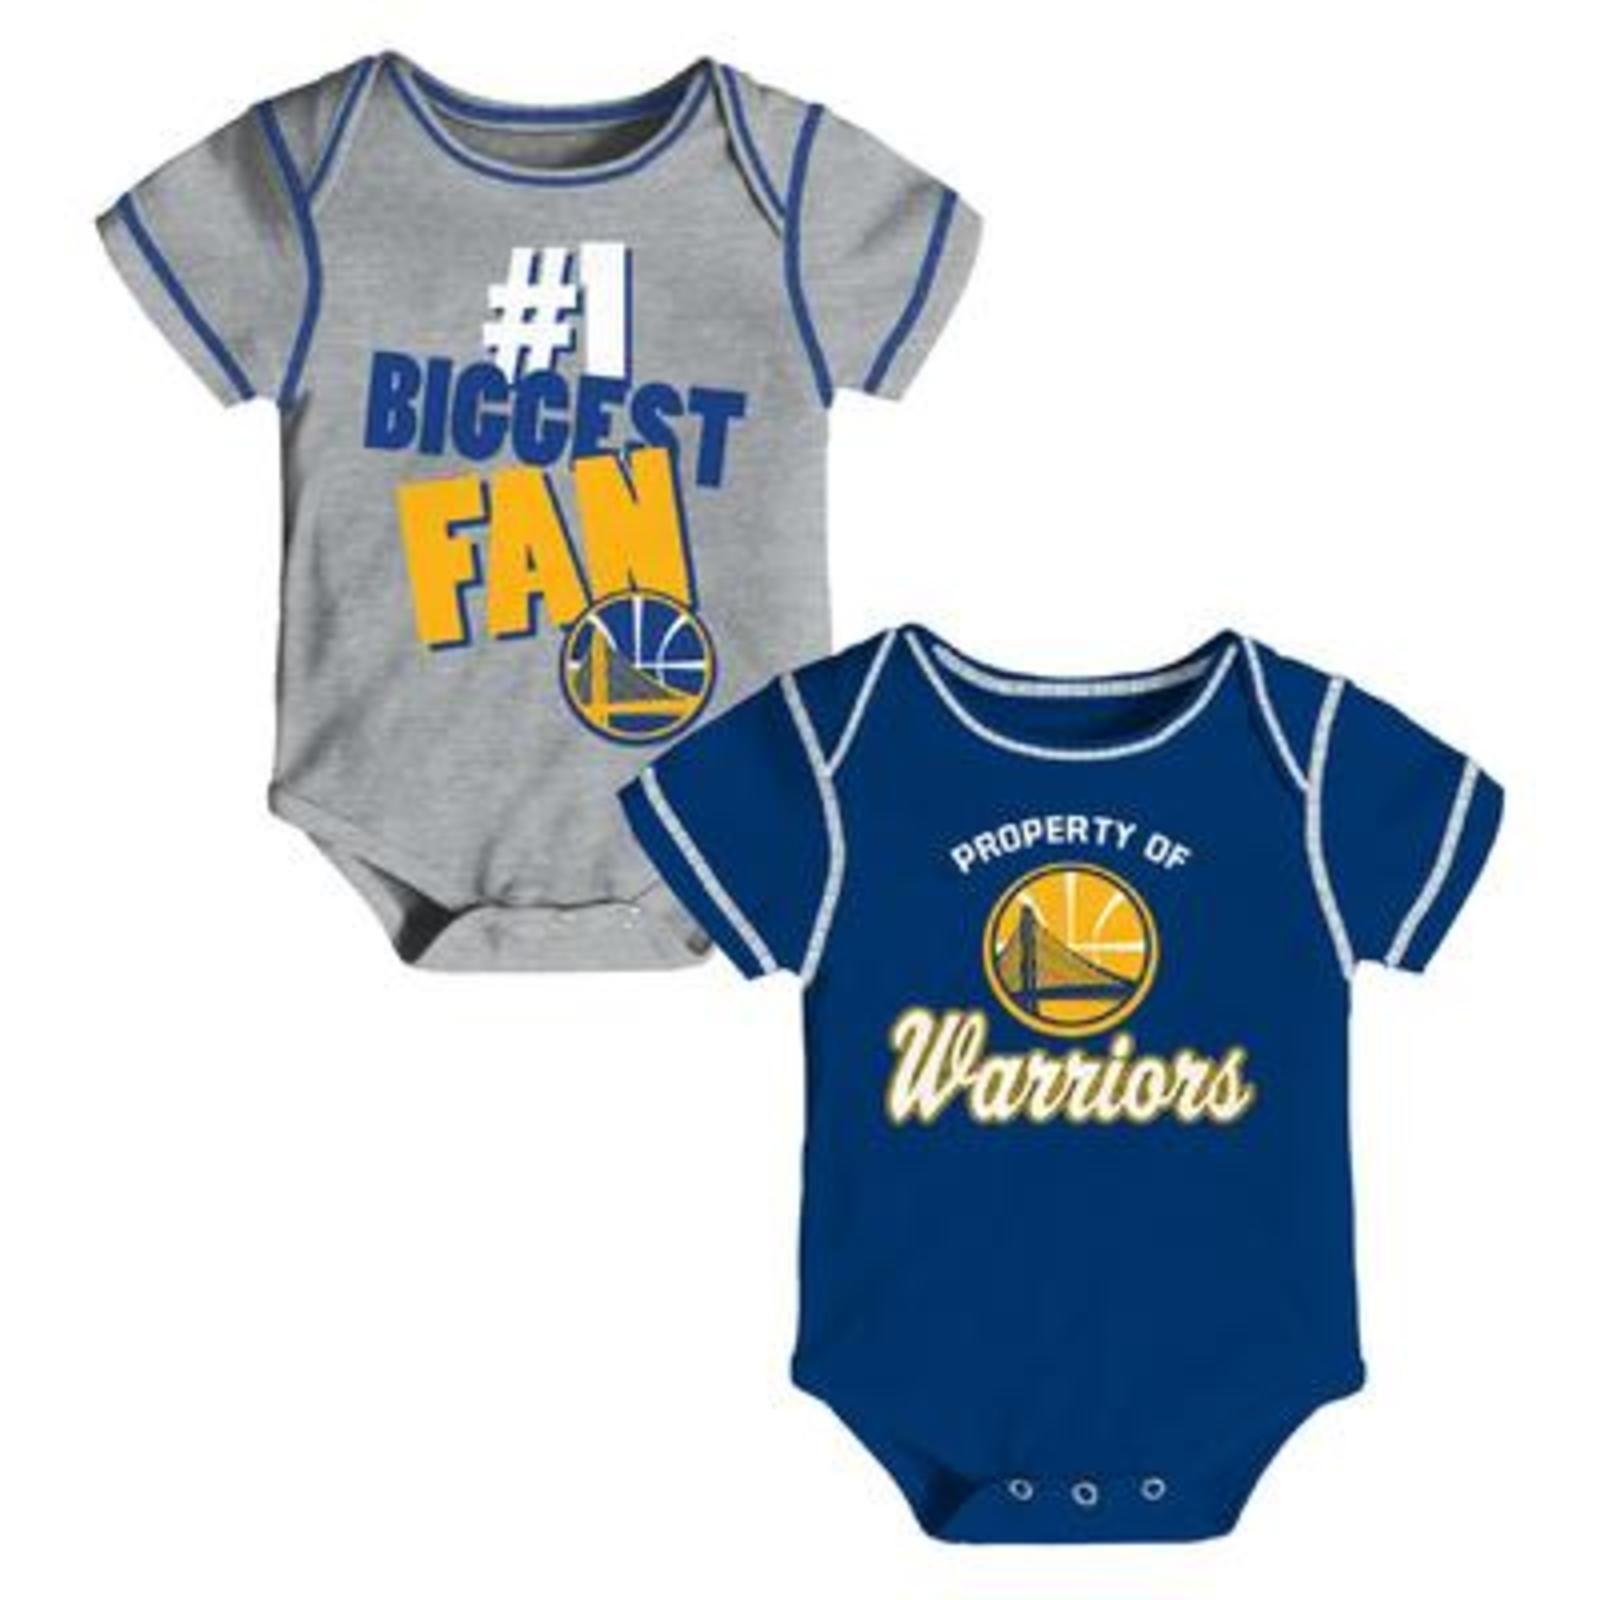 NBA Newborn & Infants 2 Pack Bodysuits Golden State Warriors